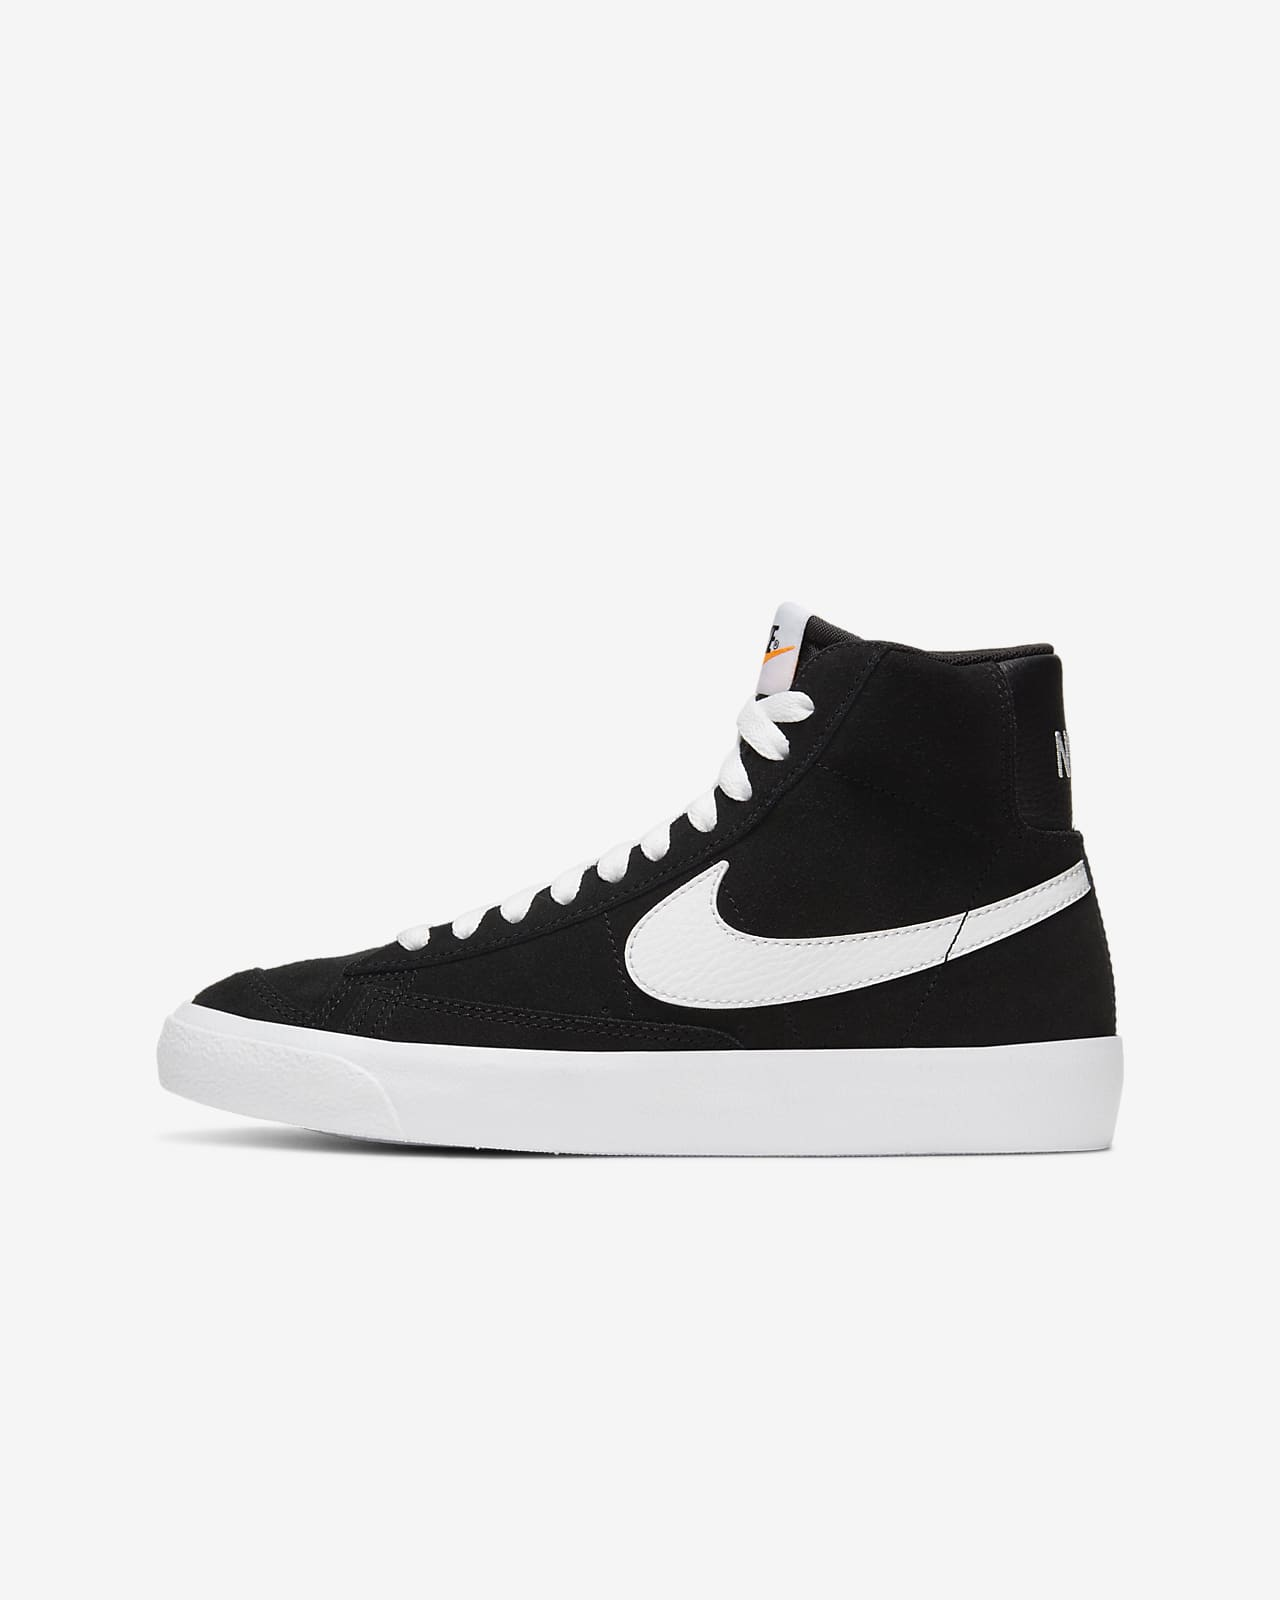 Nike Blazer Mid '77 Suede Older Kids' Shoes. Nike LU